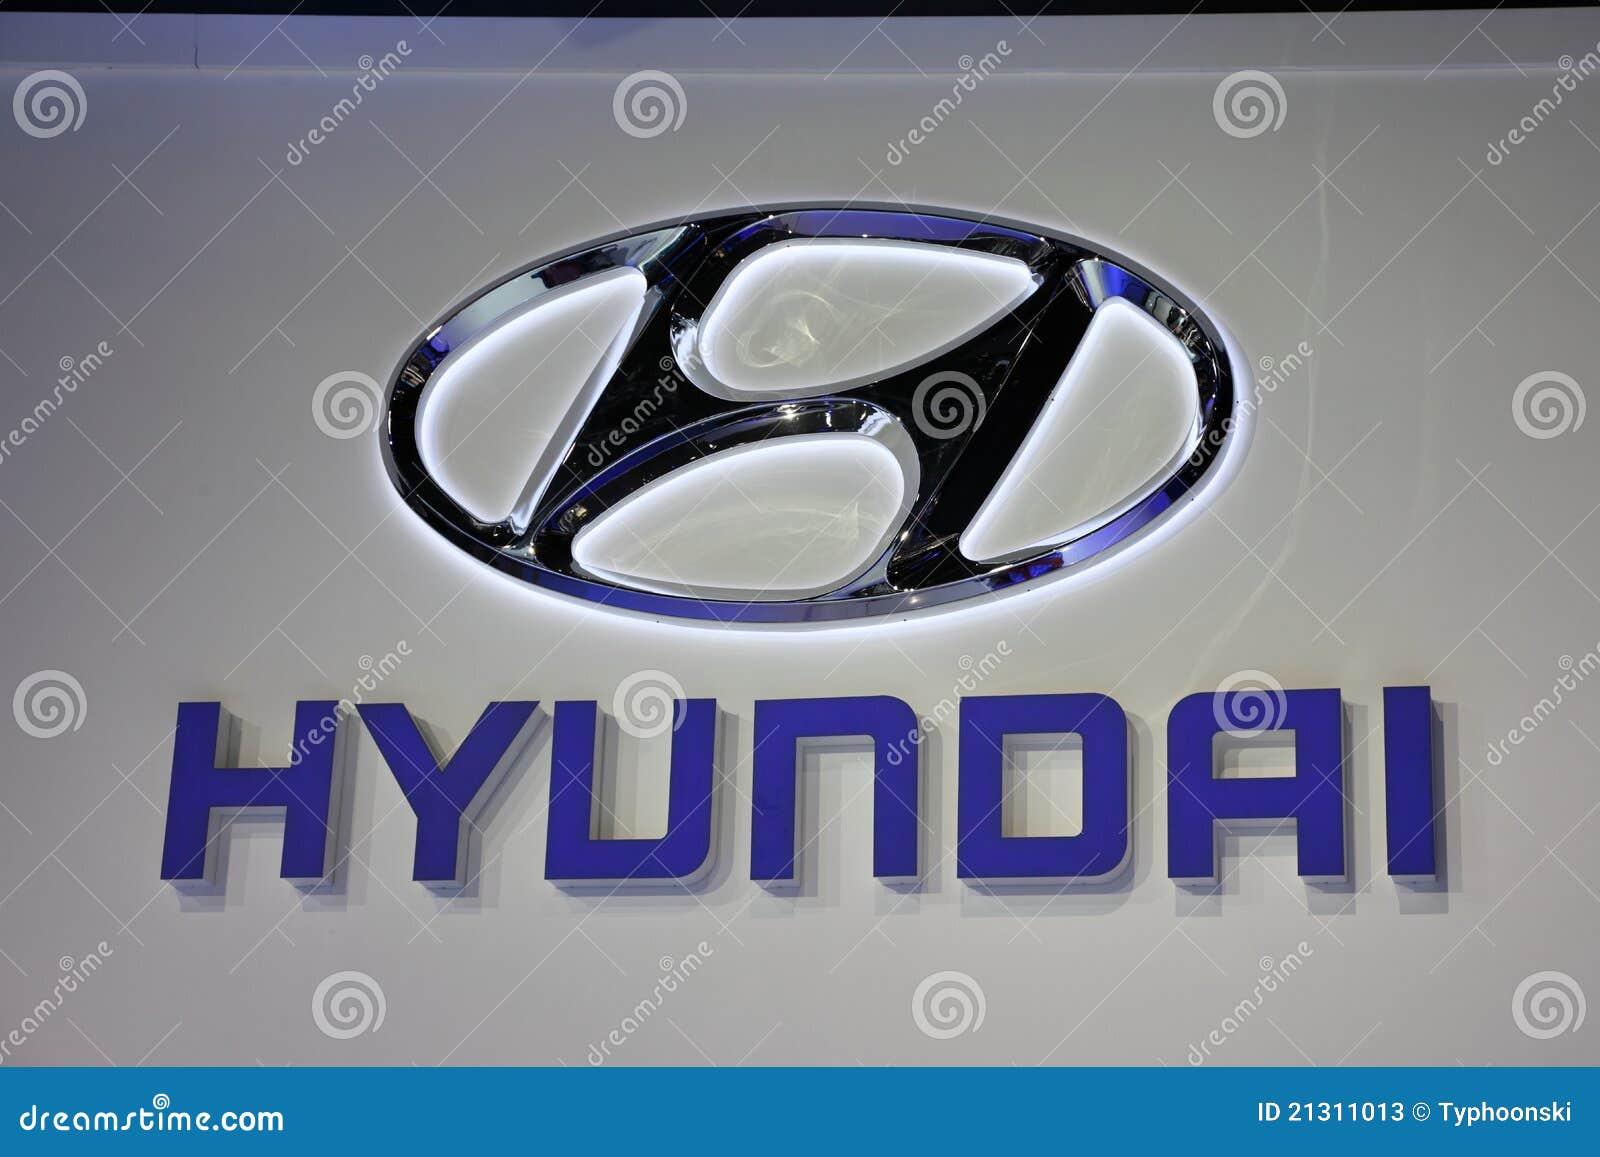 Hyundai Company Logo Editorial Stock Photo Image Of